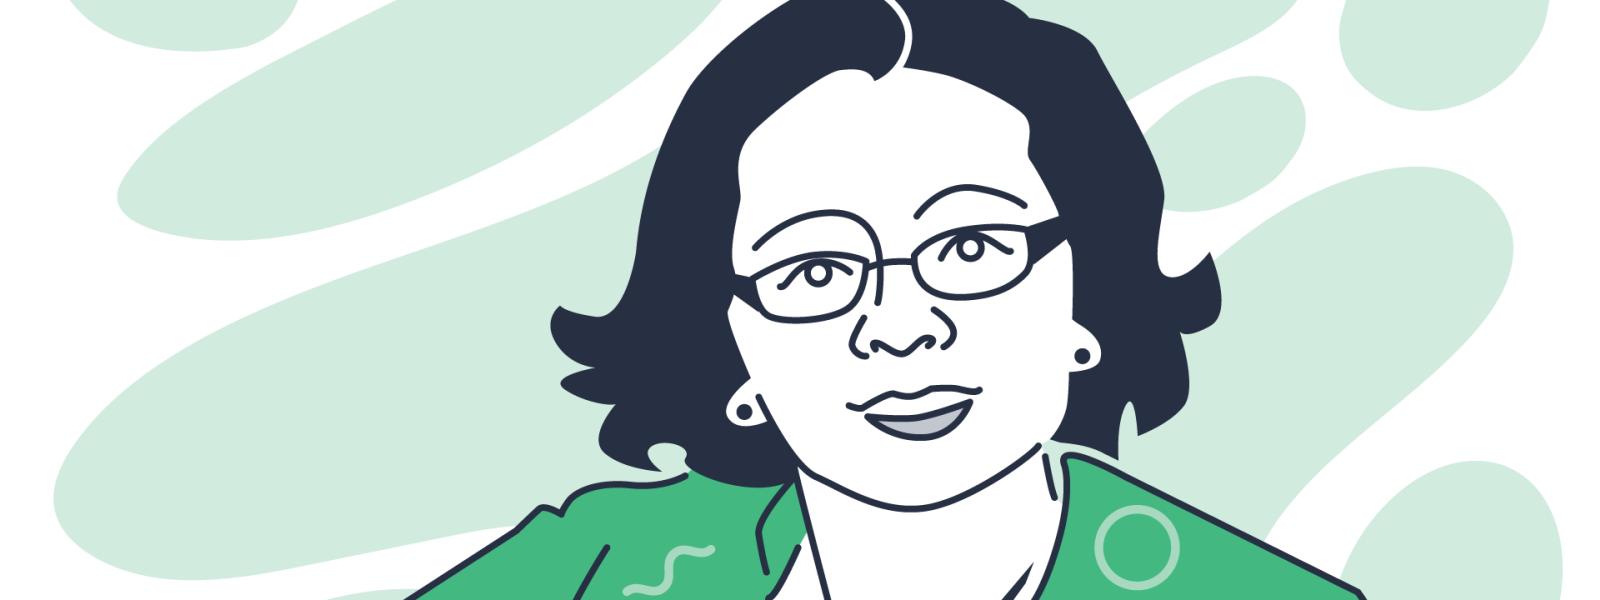 Independent Board Director, Irene Chang Britt, on an Enviable Career